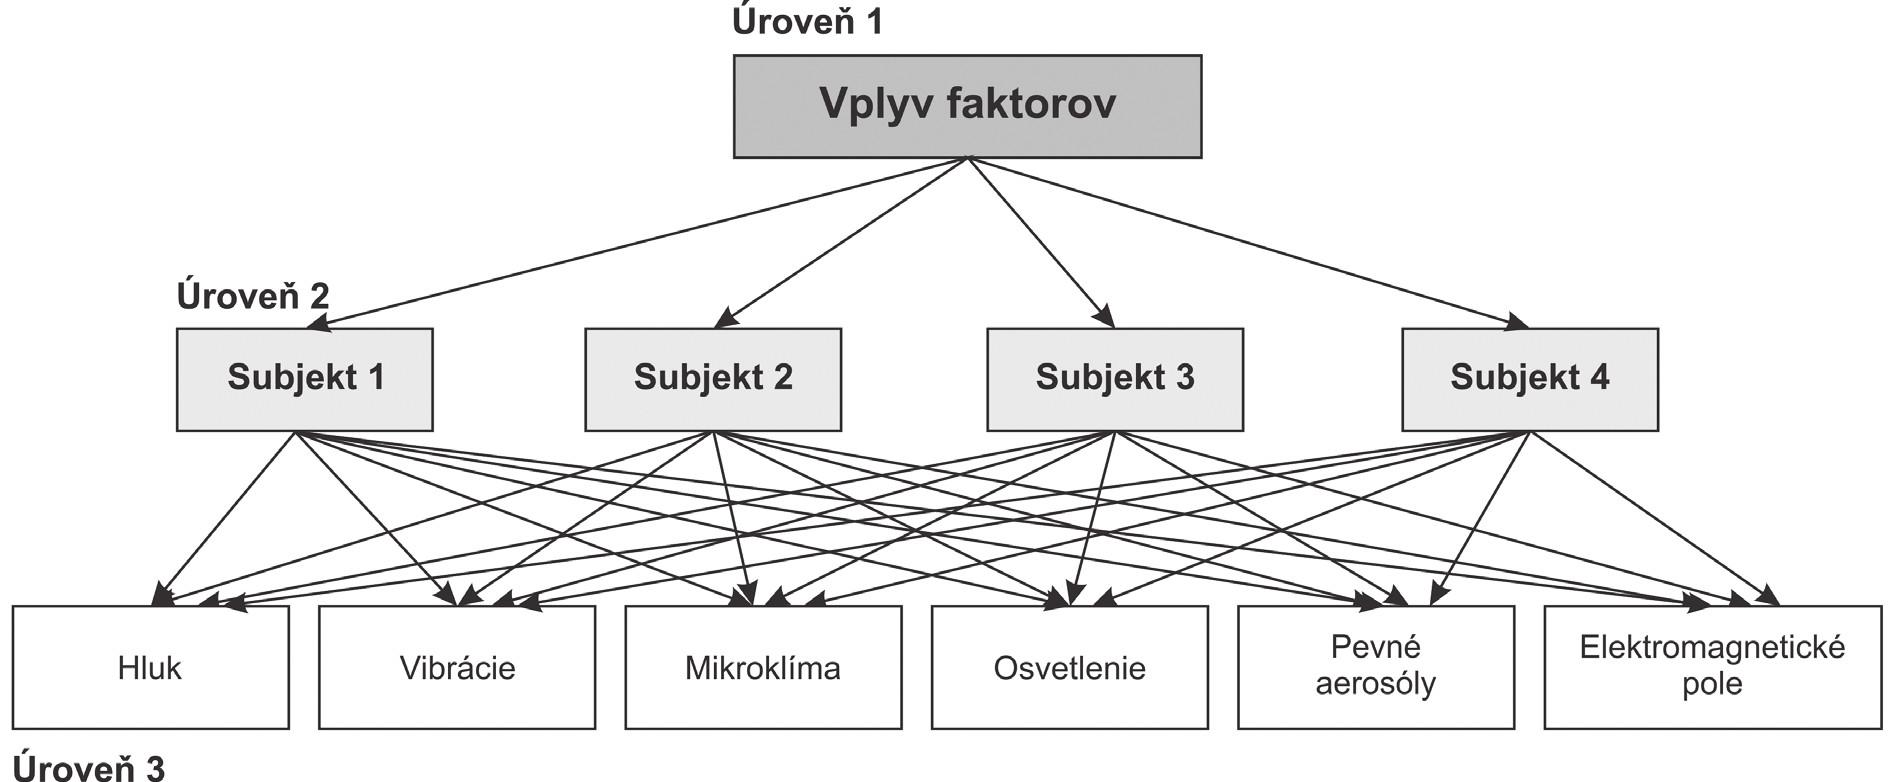 Hierarchická štruktúra Saatyho metódy